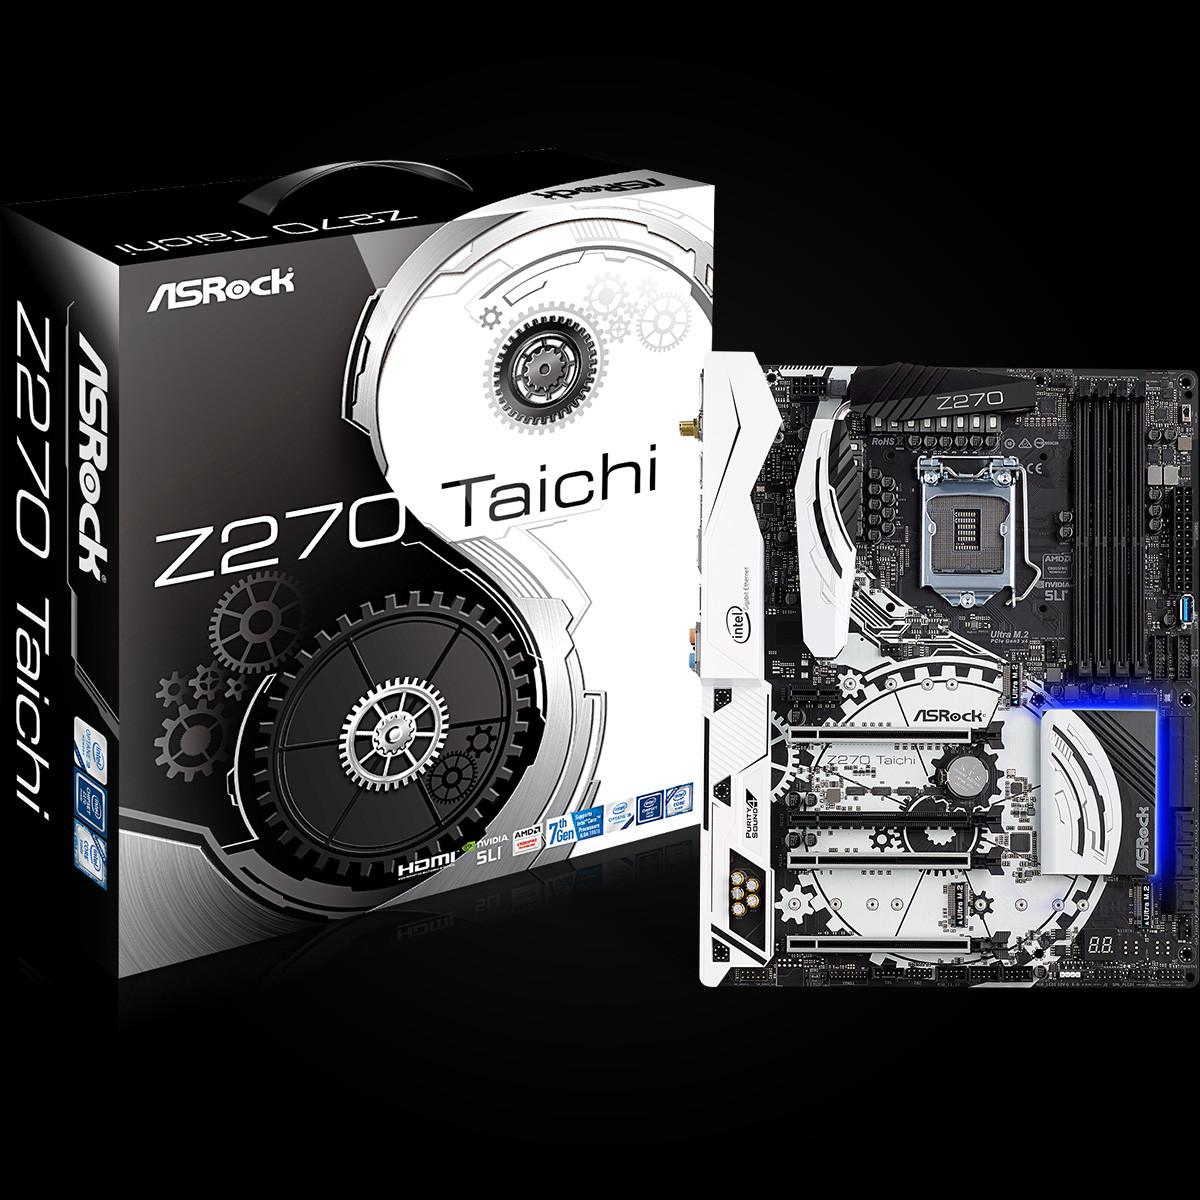 News Posts Matching Z270 Techpowerup Mainboard Motherboard Gigabyte Ga Phoenix Gaming Socket 1151 Kaby Lake Intel Asrock Announces Its 200 Series Chipset Lineup